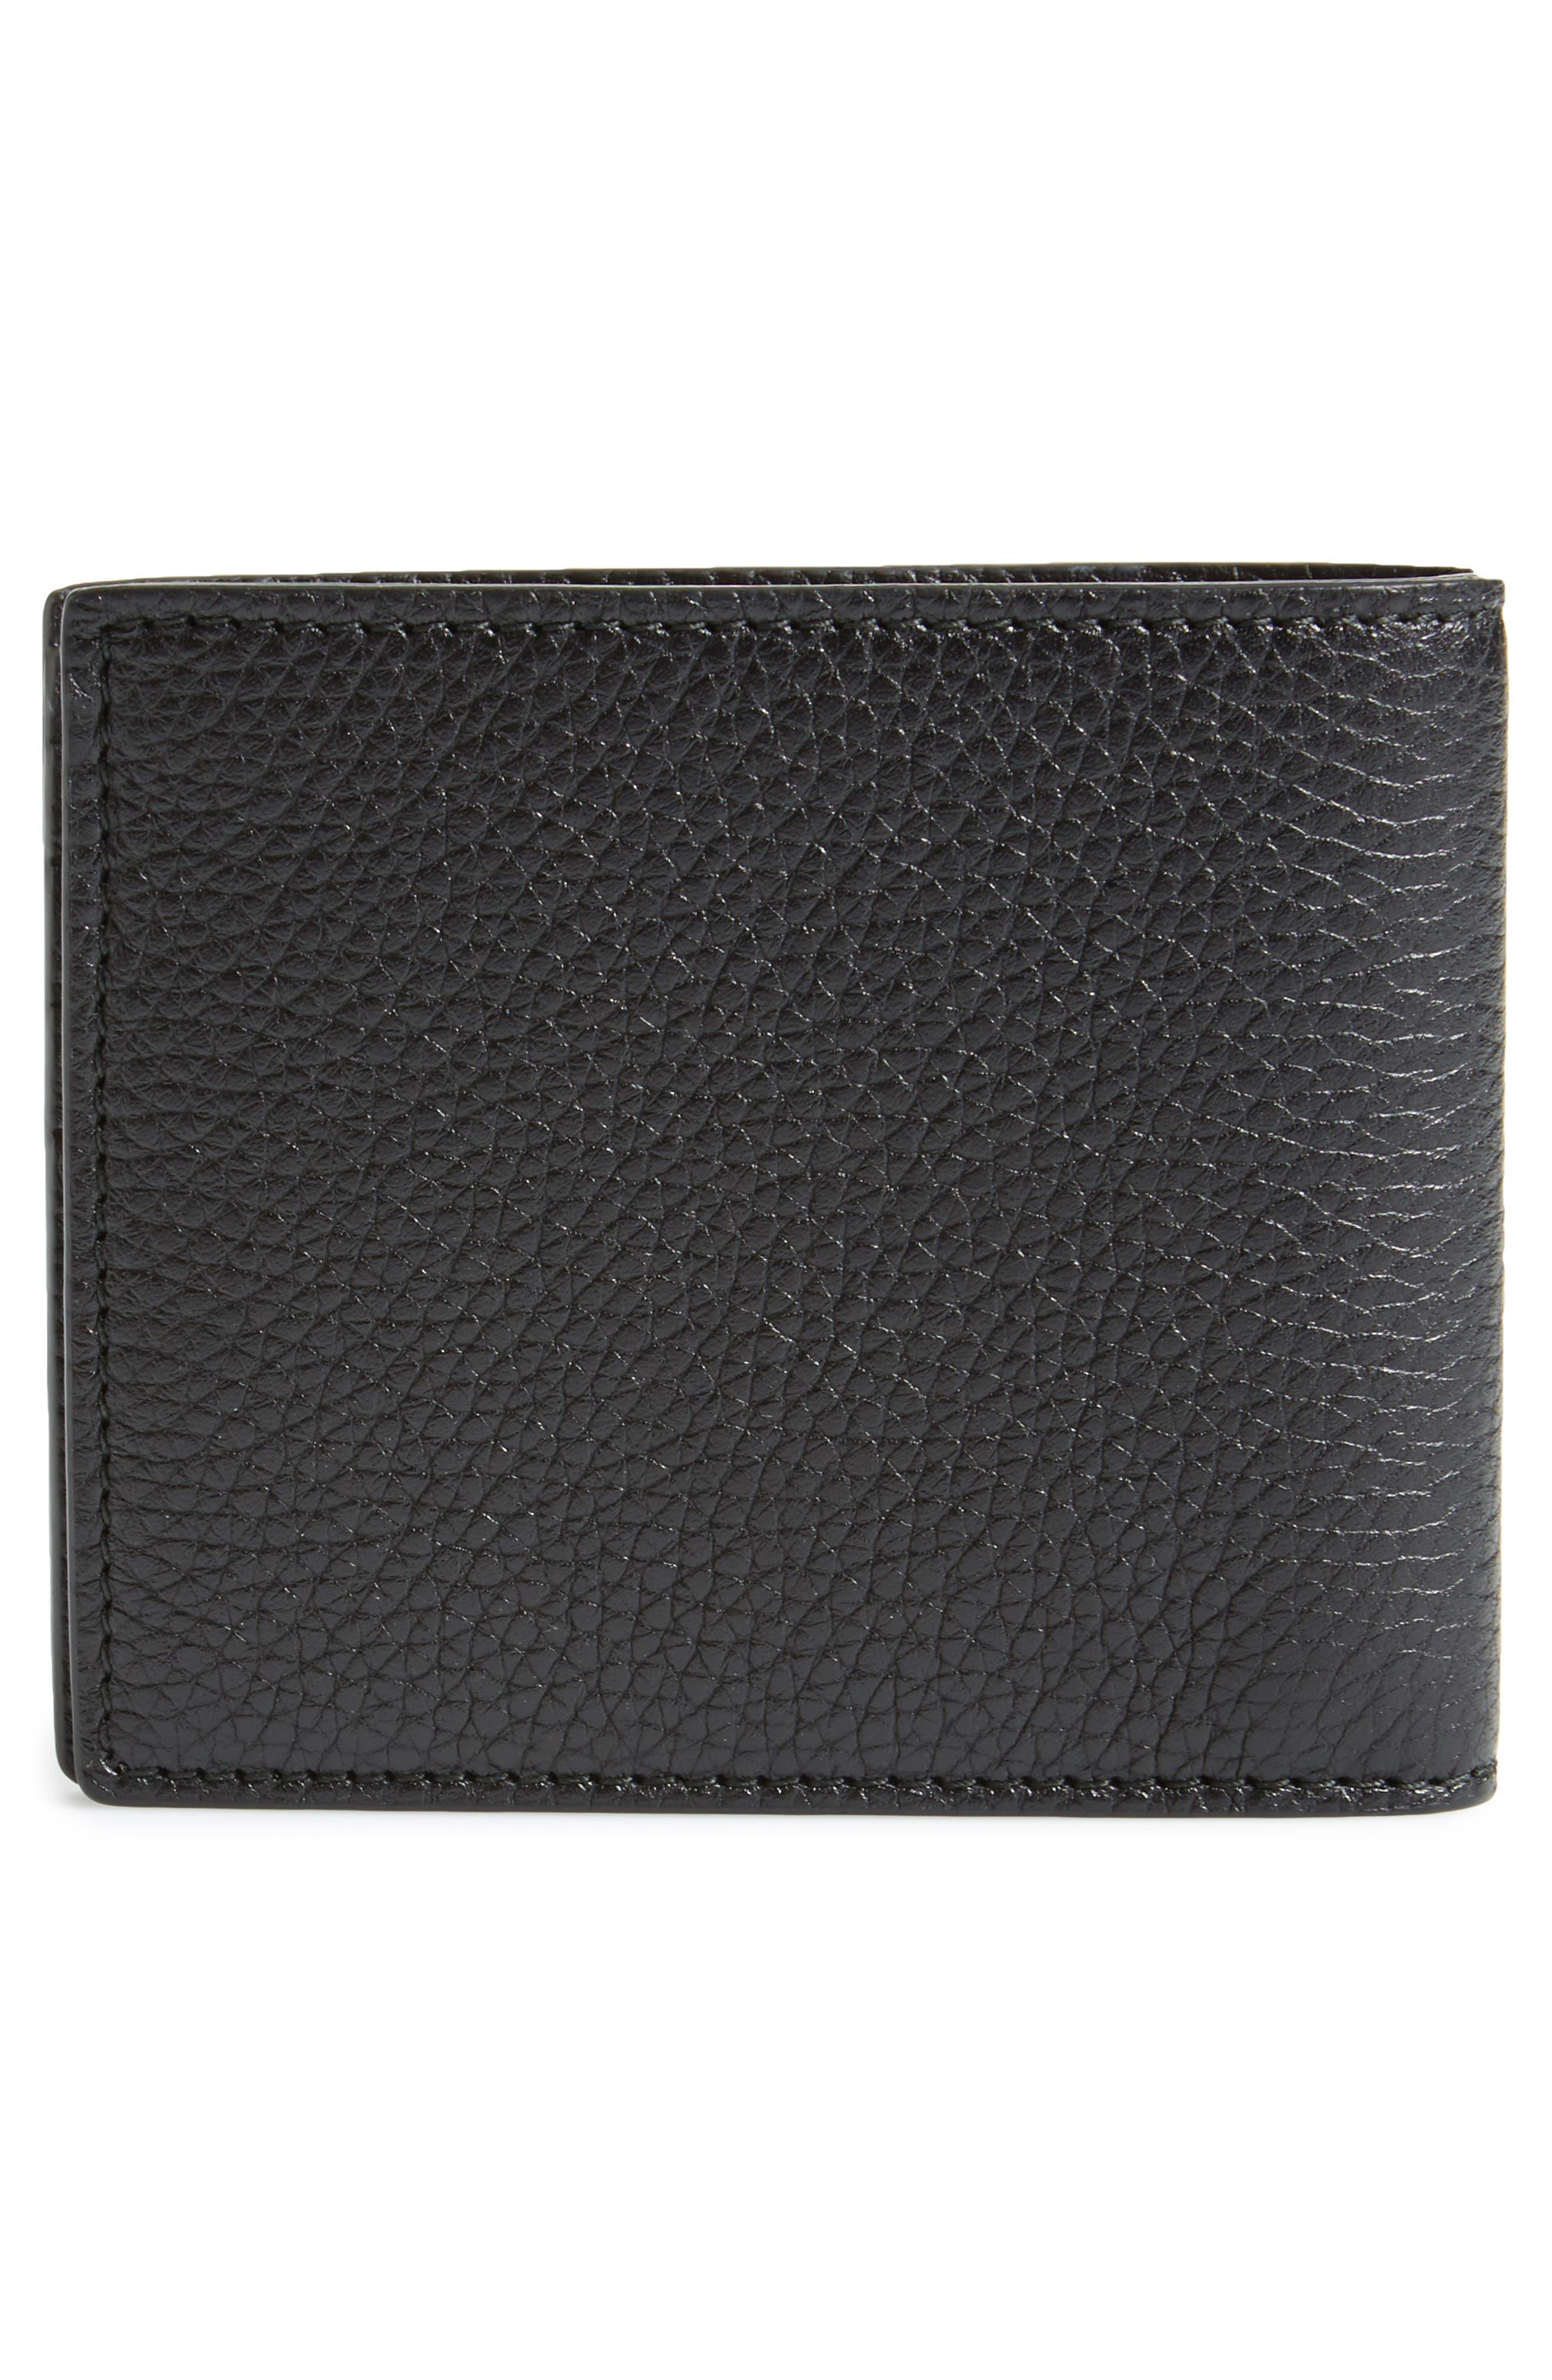 Dragon Leather Wallet,                             Alternate thumbnail 3, color,                             001